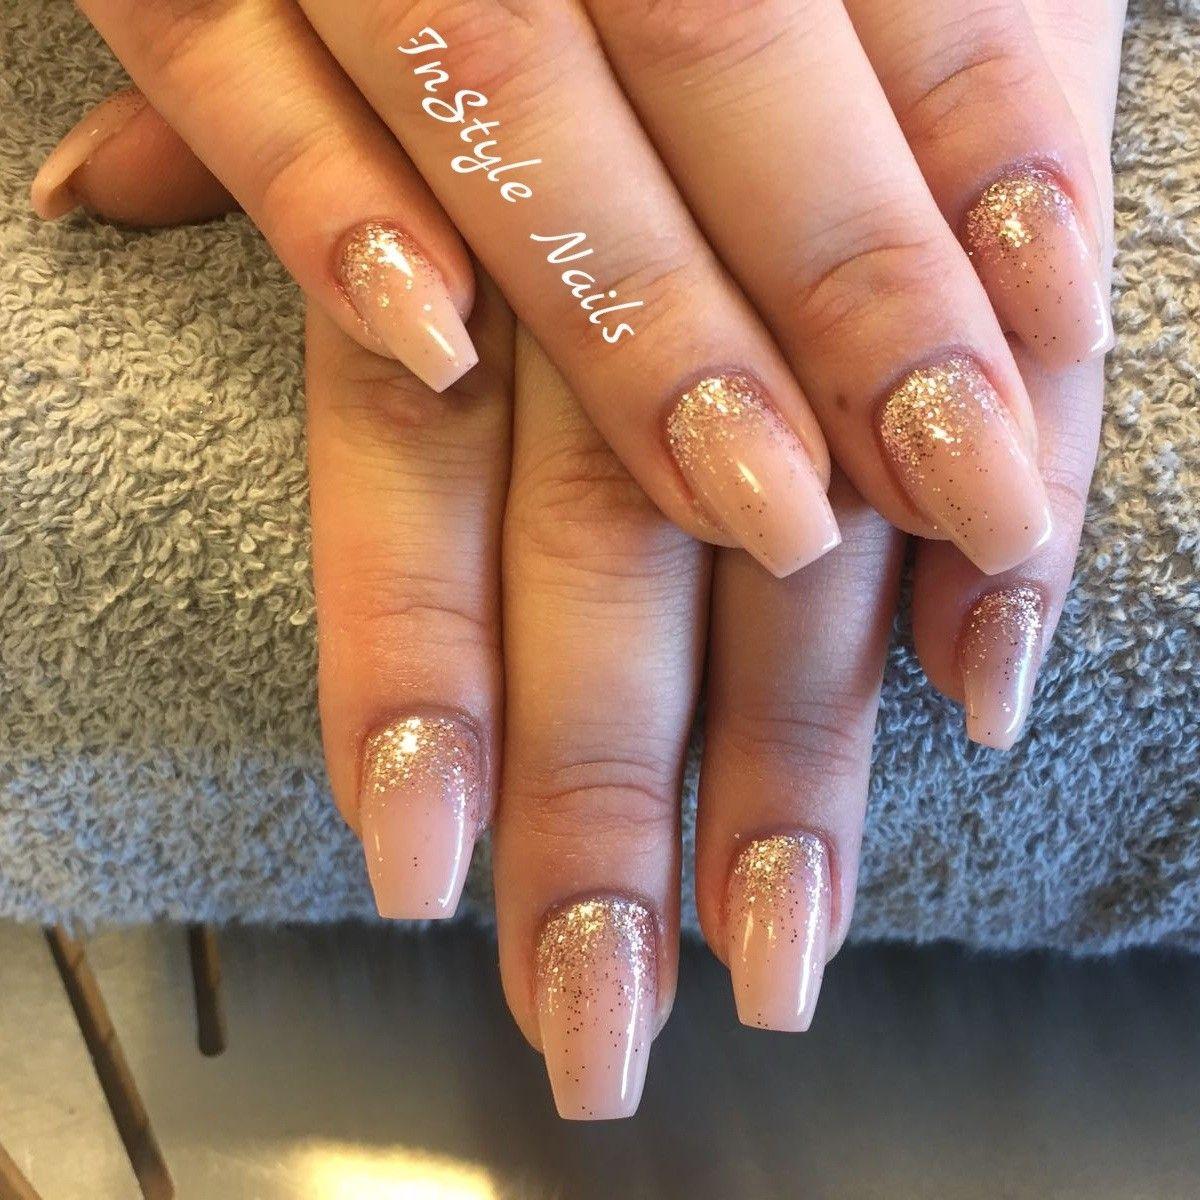 Acrylic Nails nail art glitters ##instylenails | nails | Pinterest ...